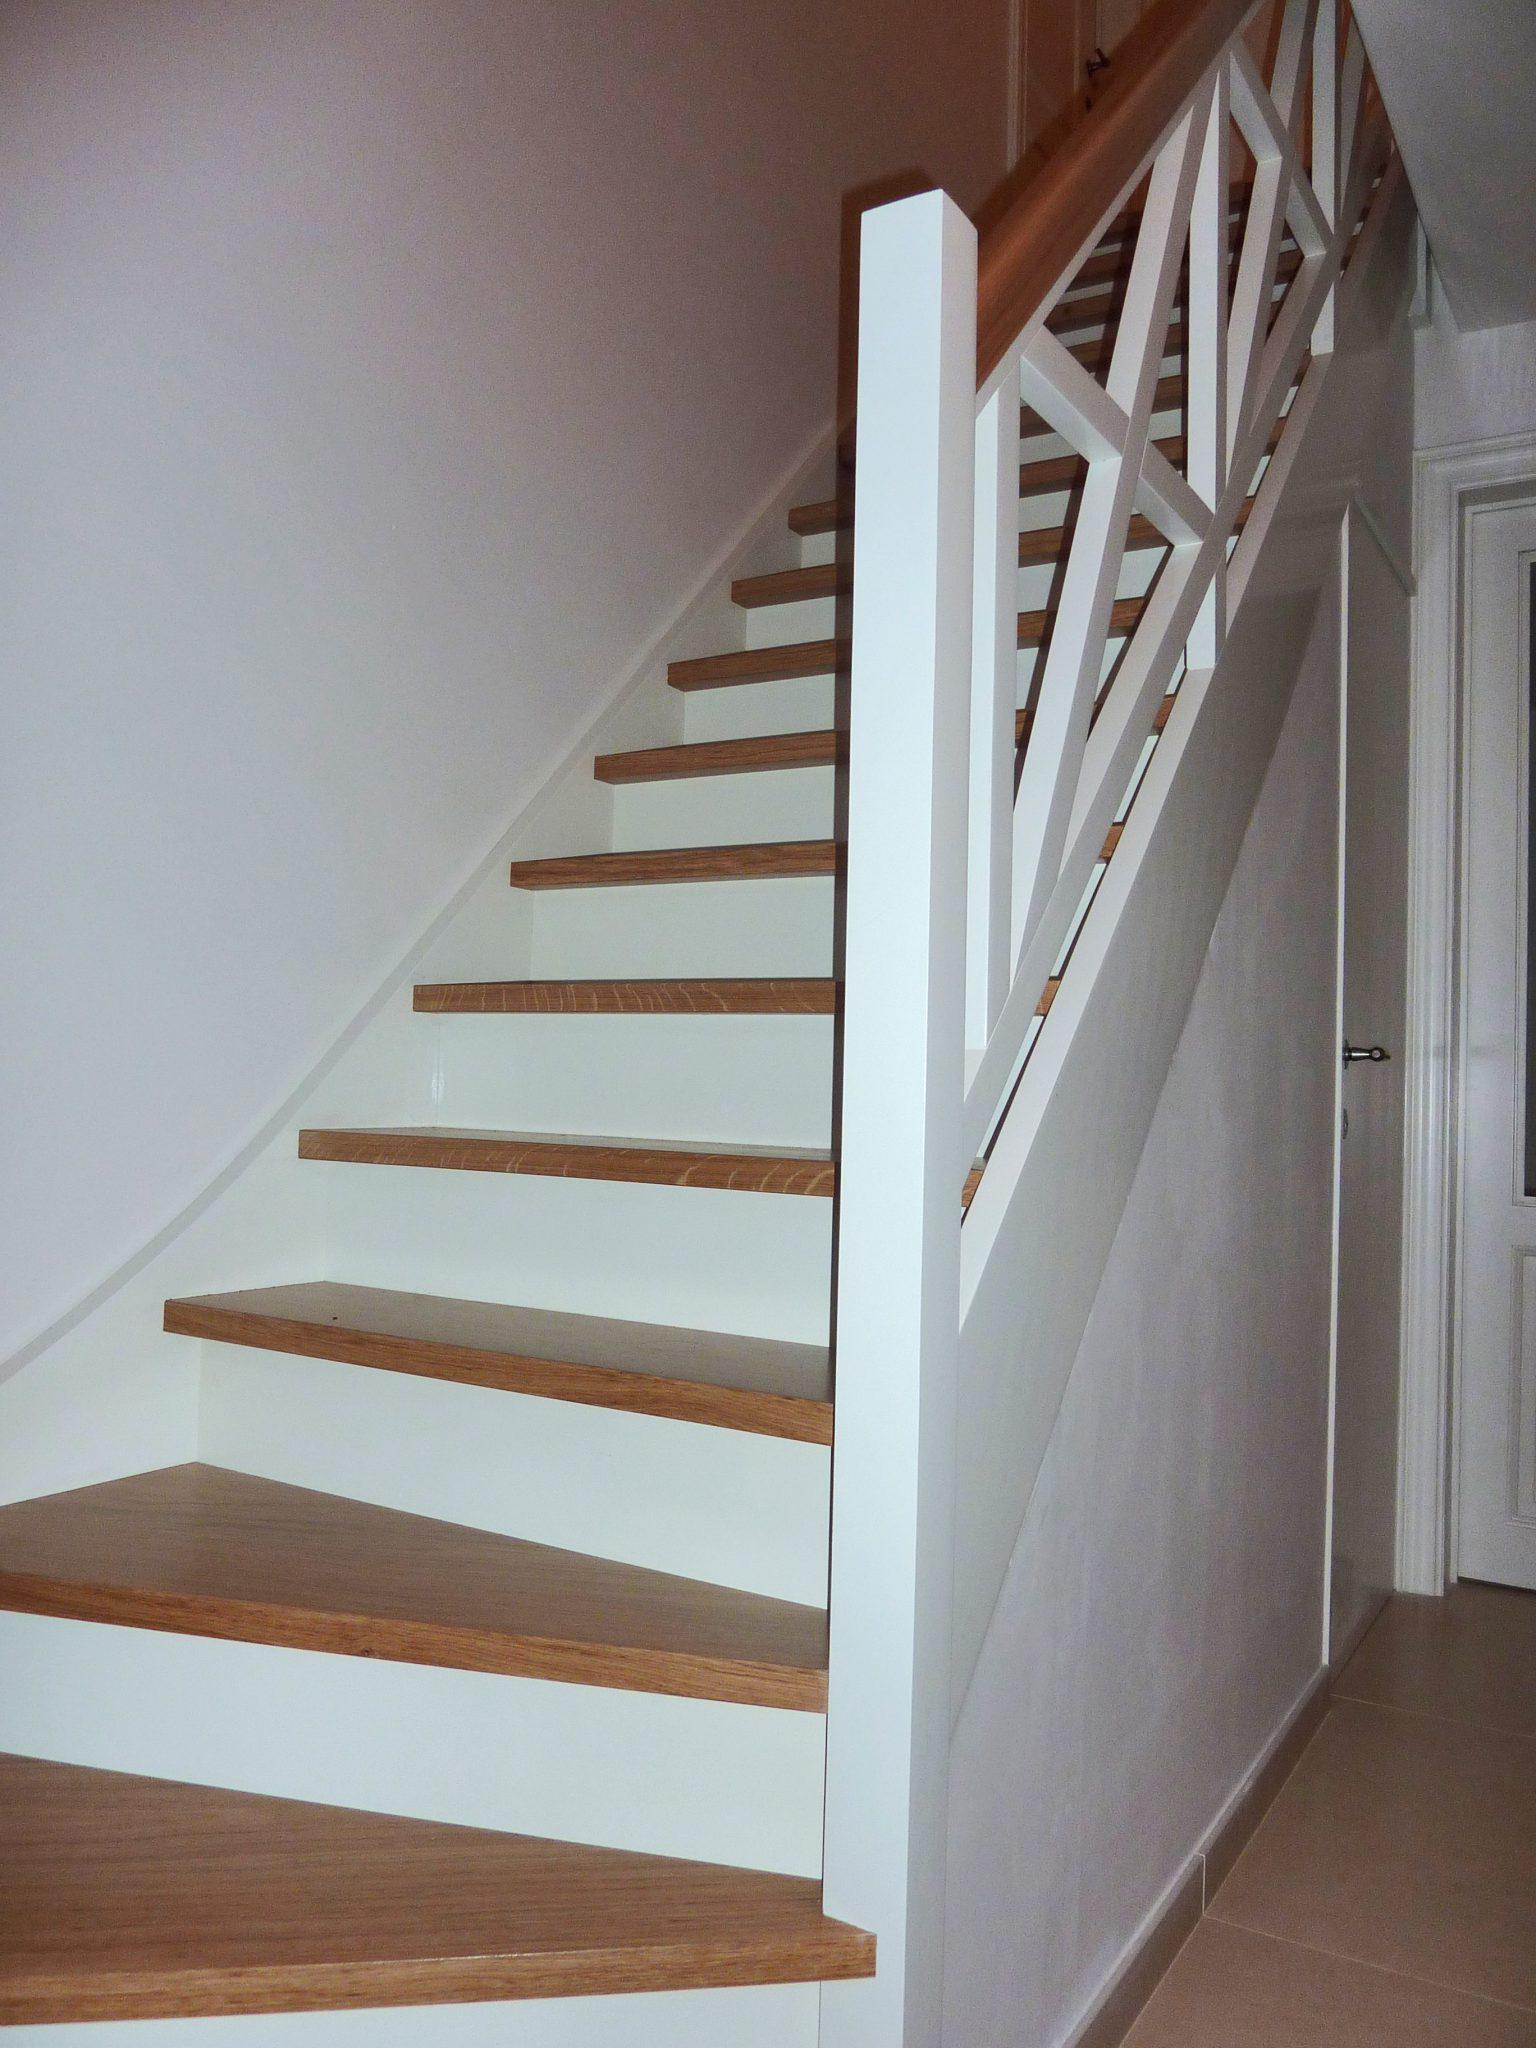 Stijlen trappenmaker johan proot brugge for Goedkope trappenmaker